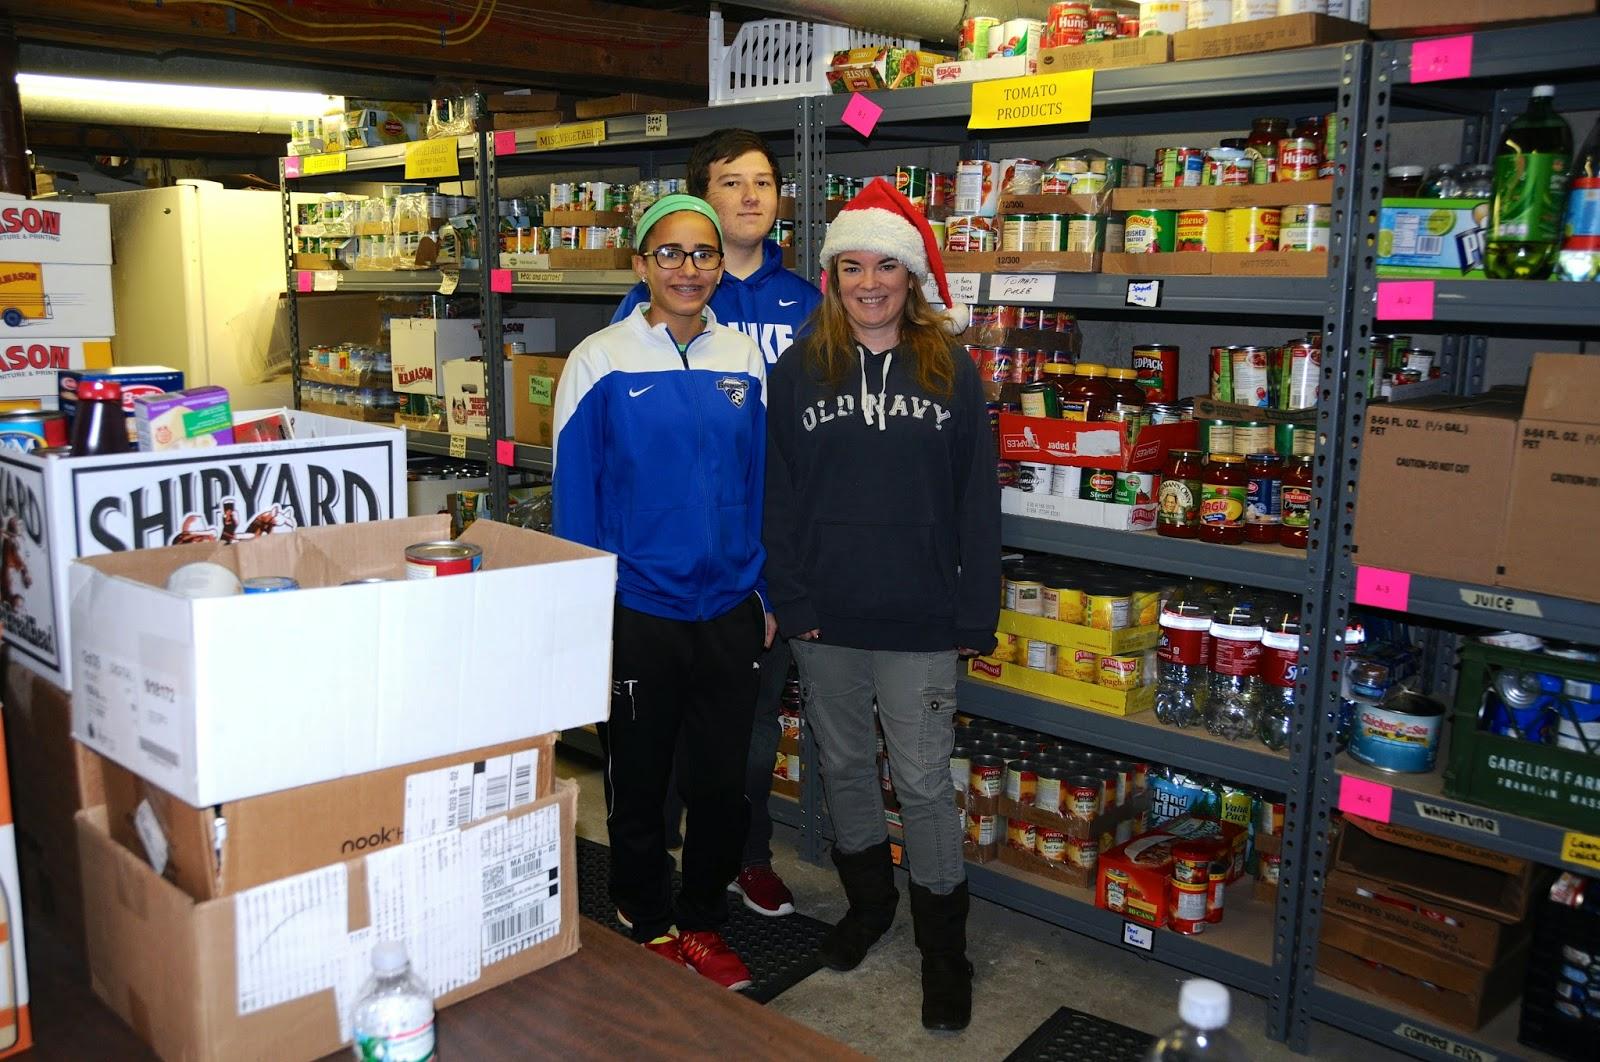 (L to R) Elf Ellie Teixeira, Co-Founder Cameron Piana, Food Pantry Executive Director Erin Lynch